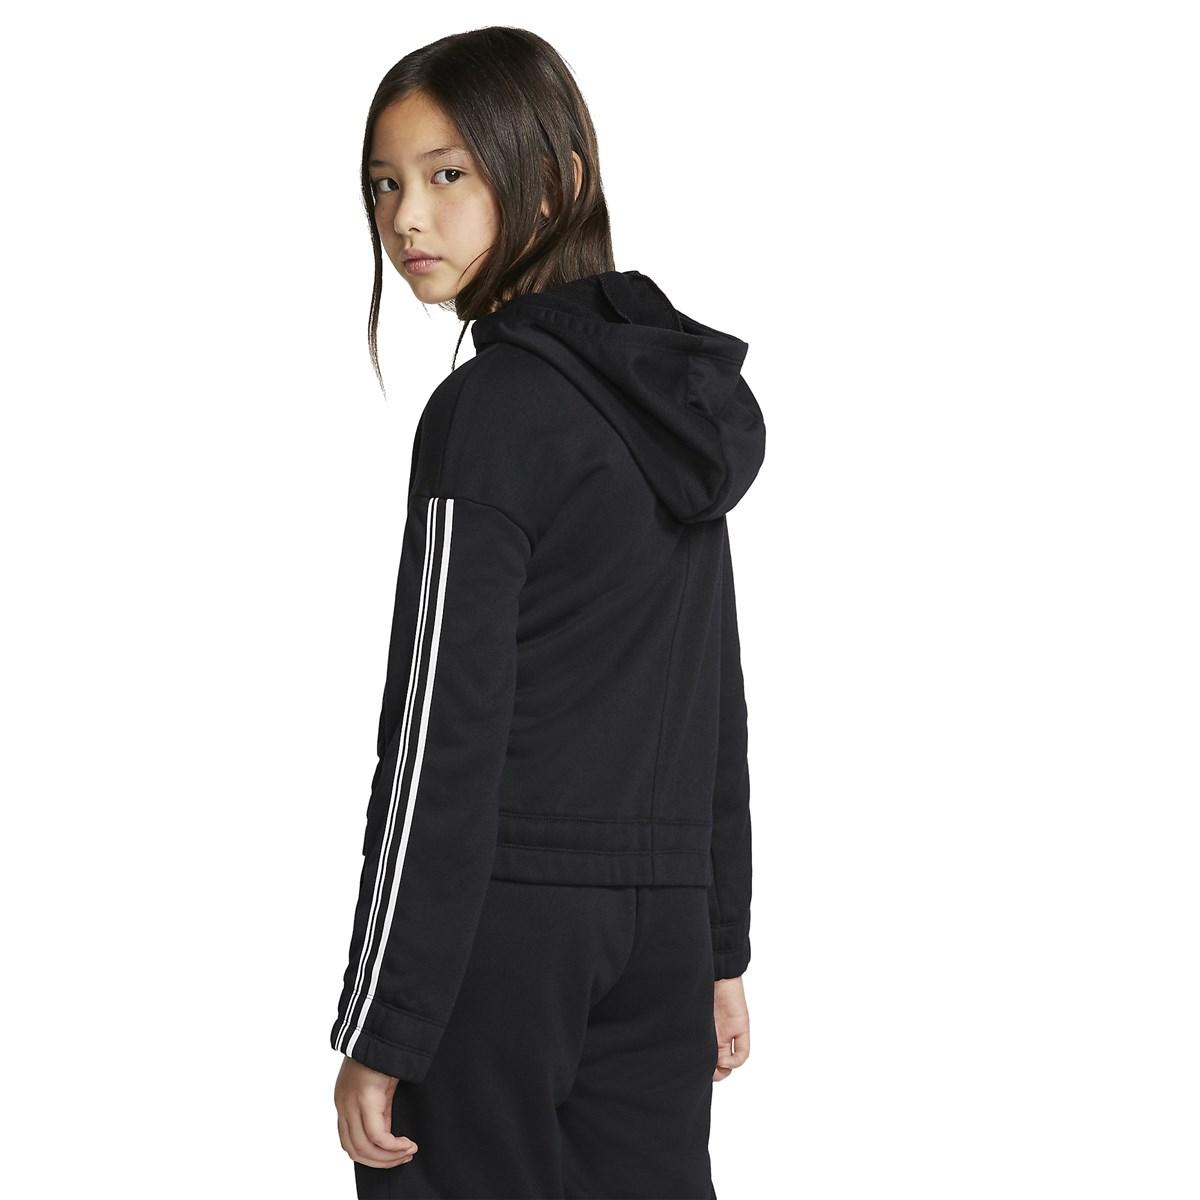 Studio Full Zip Çocuk Siyah Sweatshirt (BV2792-010)